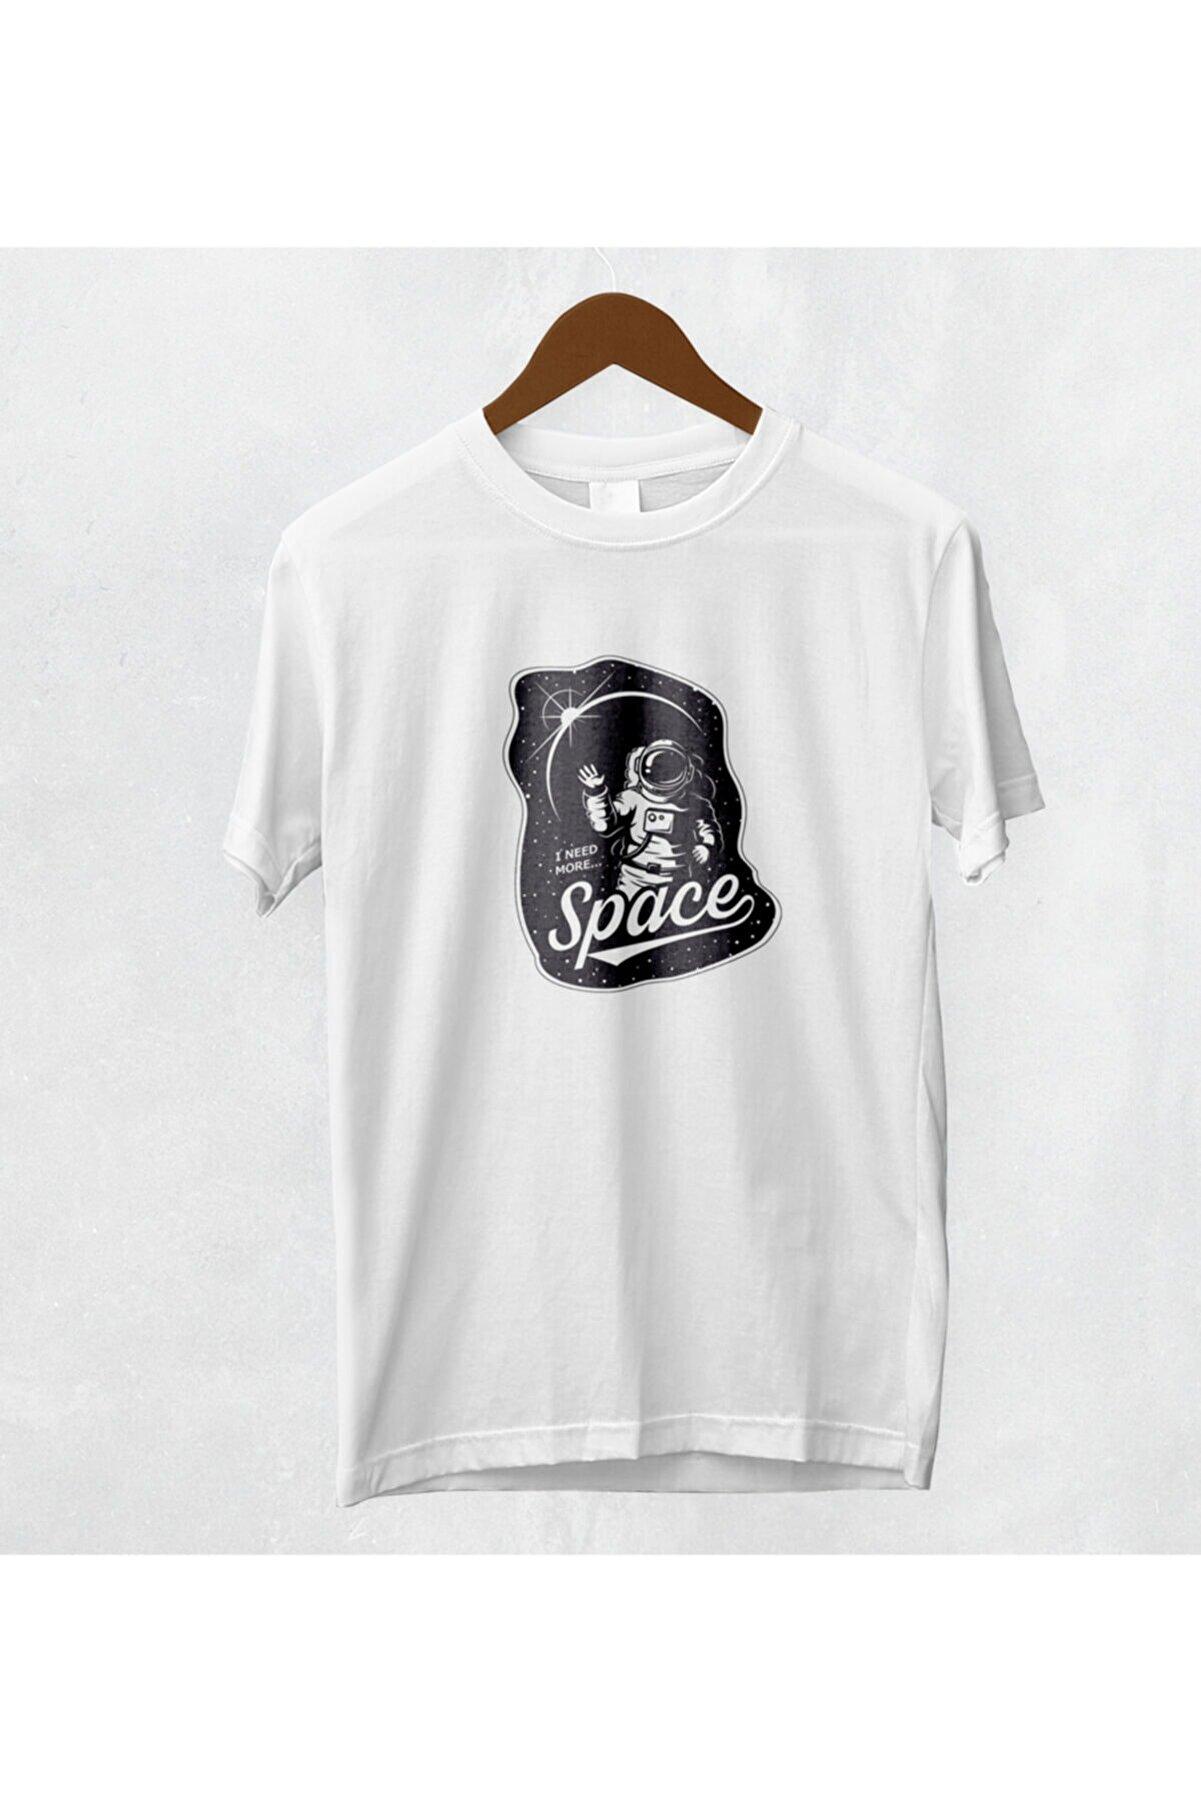 Coutoo I Need More Space Baskılı Beyaz Pamuk Polyester T-shirt